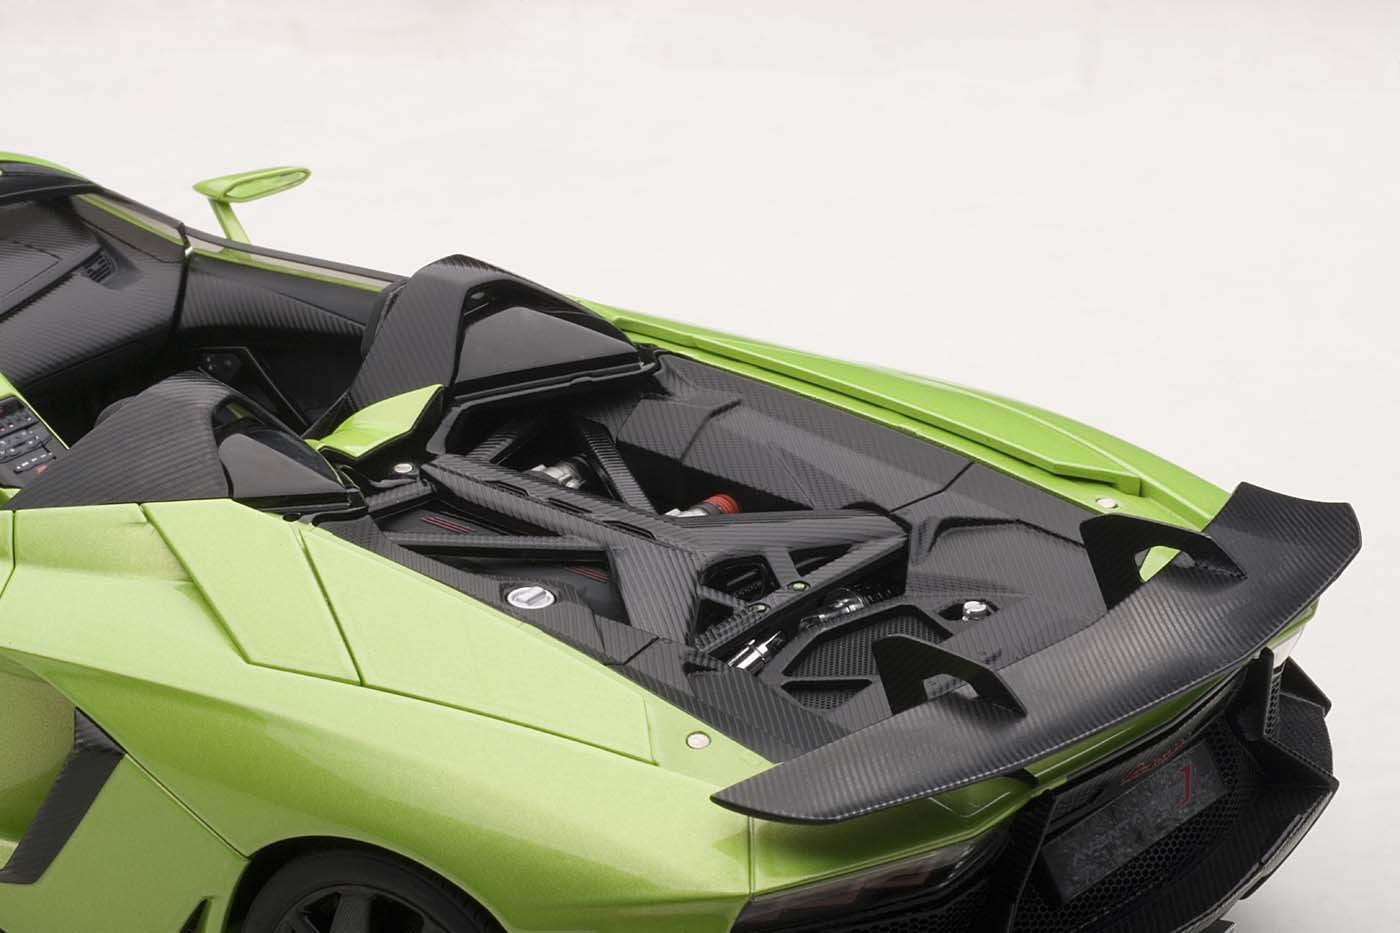 Lamborghini Aventador J Green 1/18 Diecast Car Model By AutoArt    Walmart.com